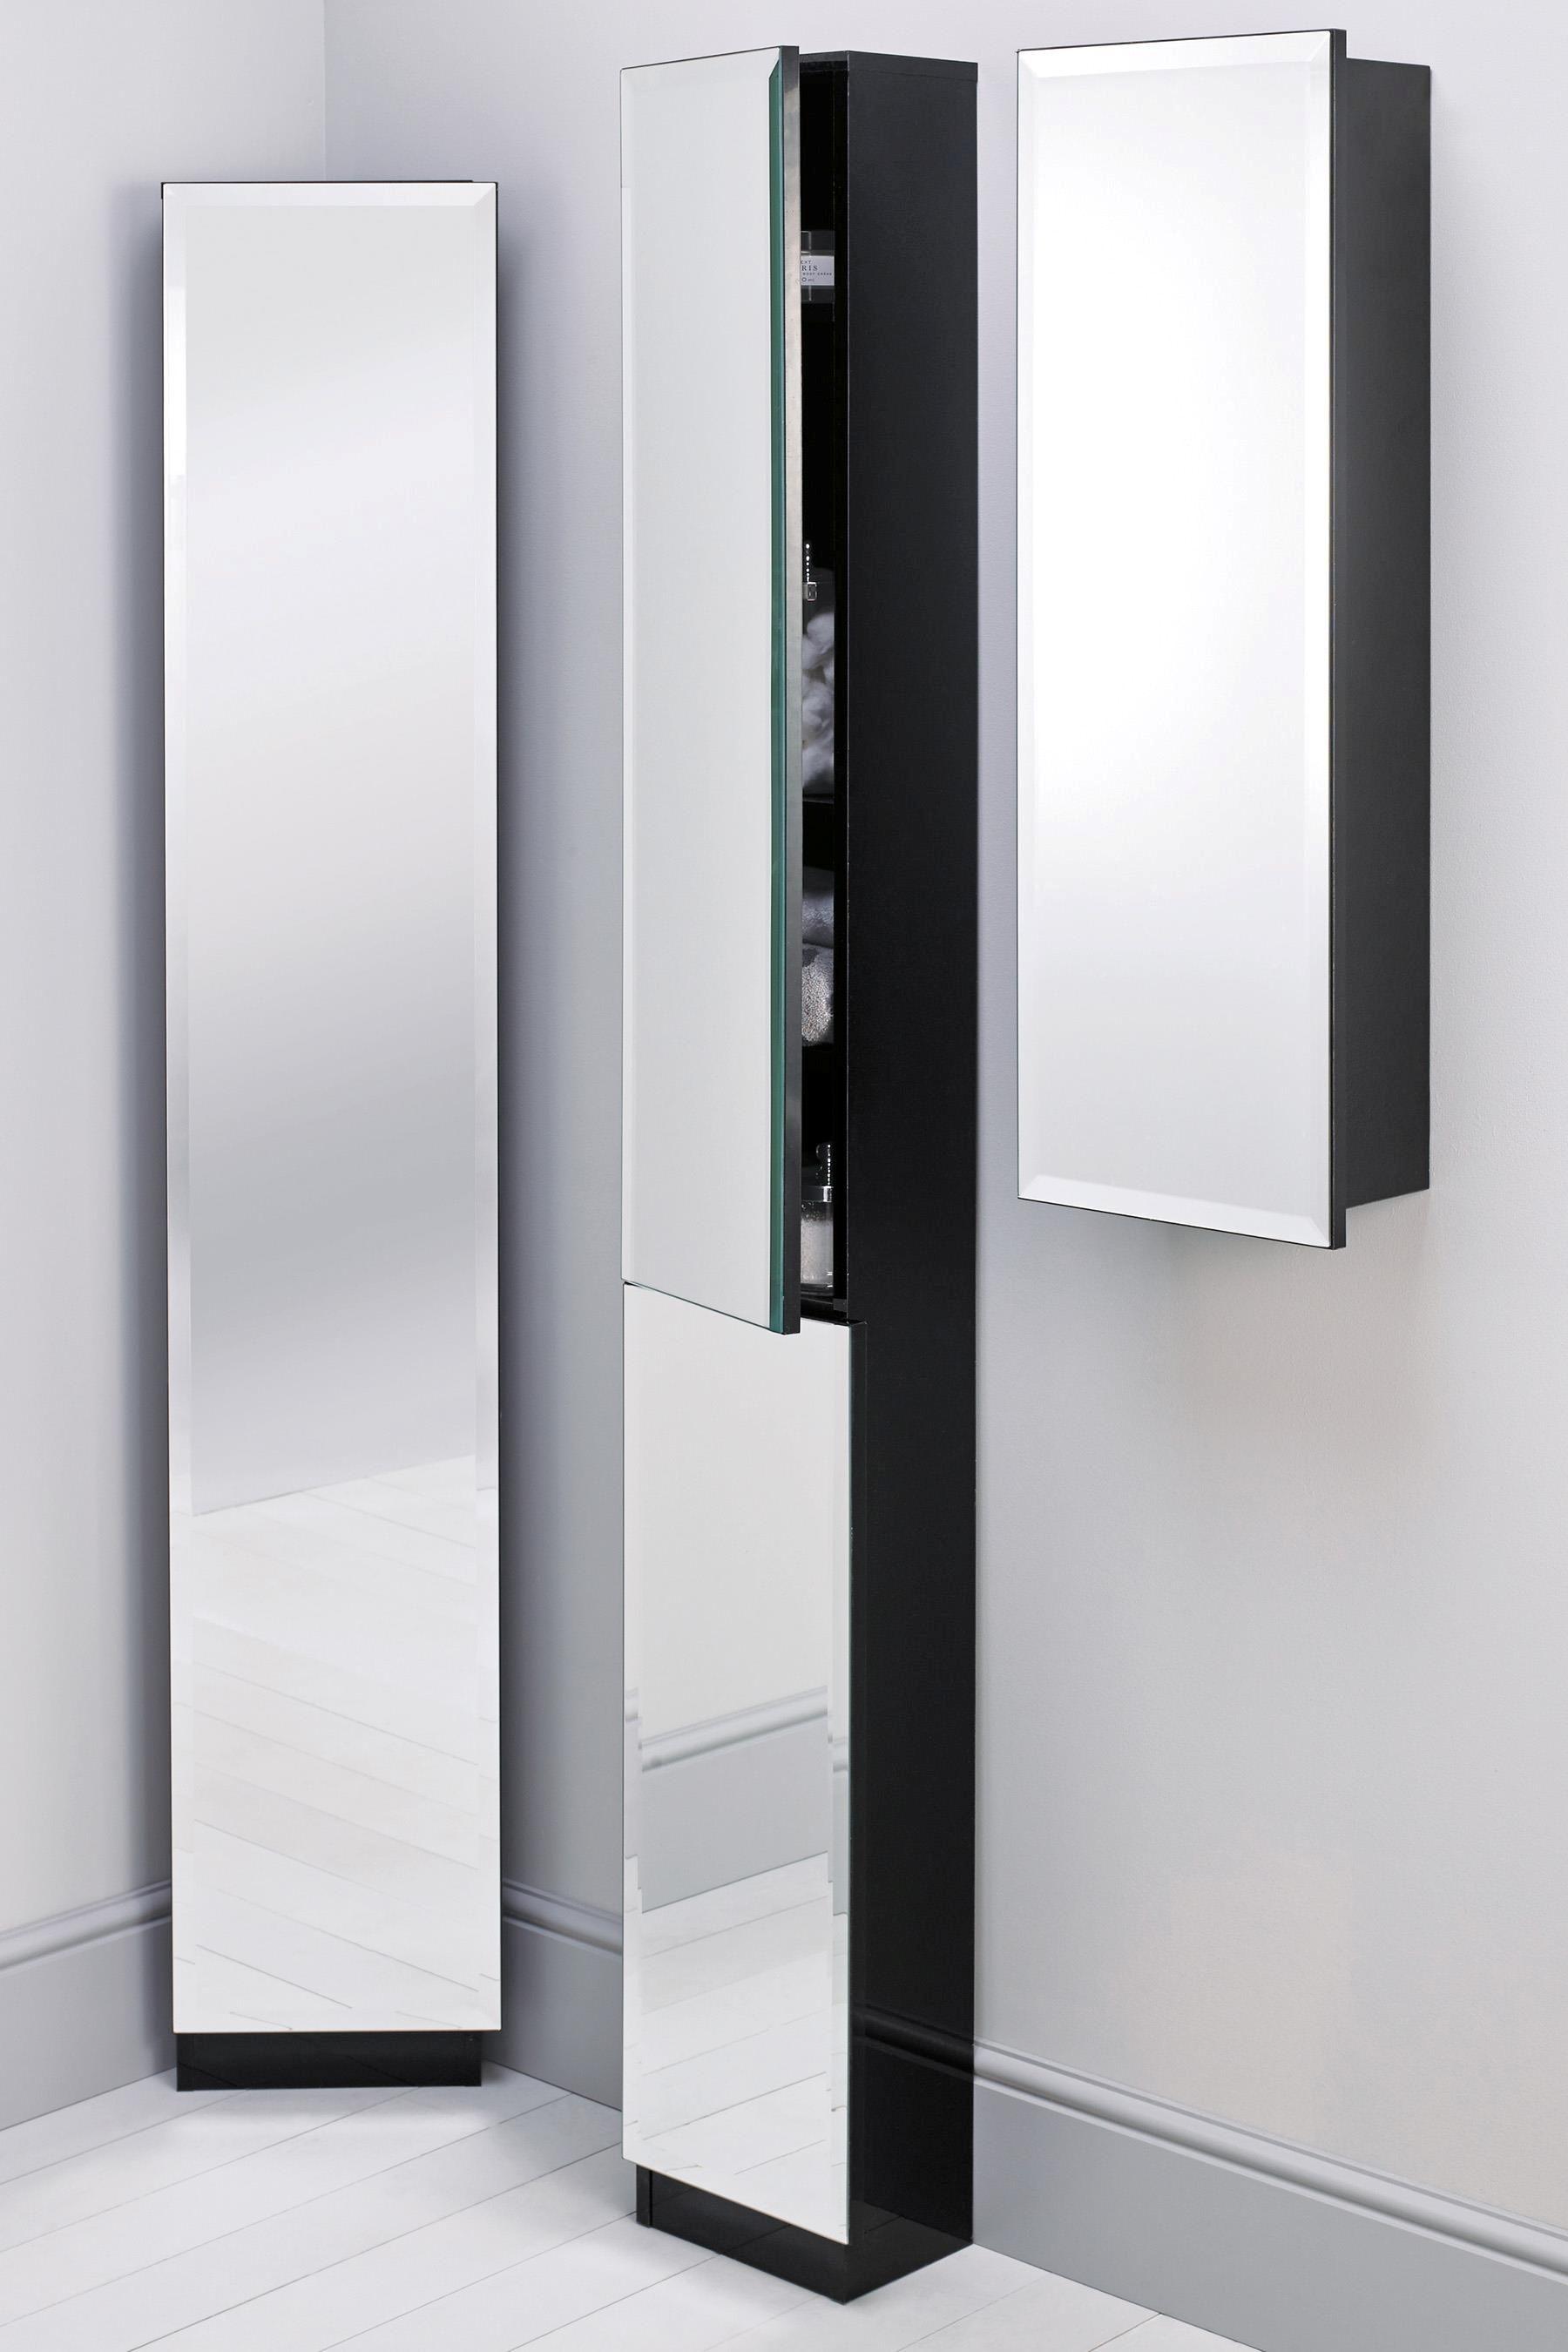 Tall Thin Bathroom Mirror